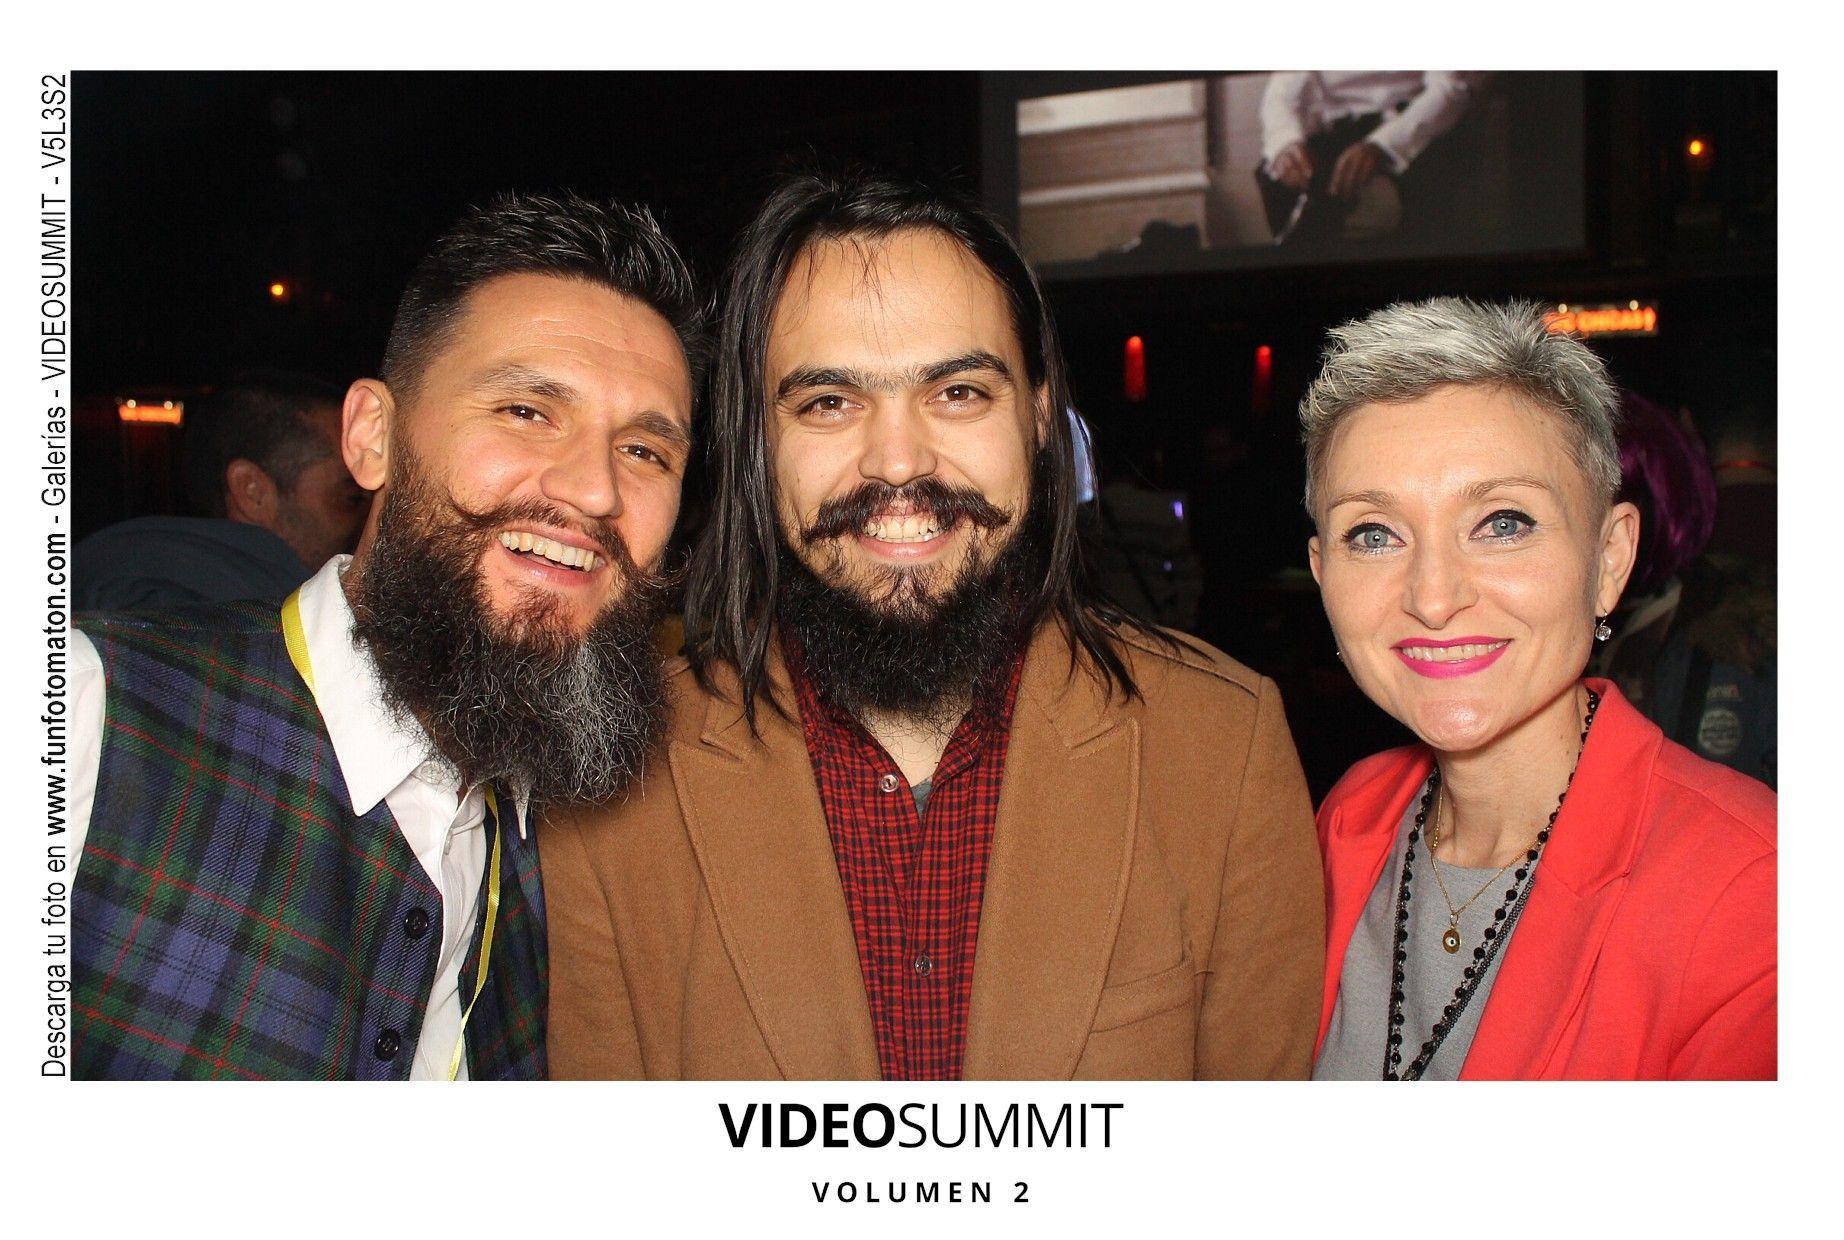 videosummit-vol2-club-party-018